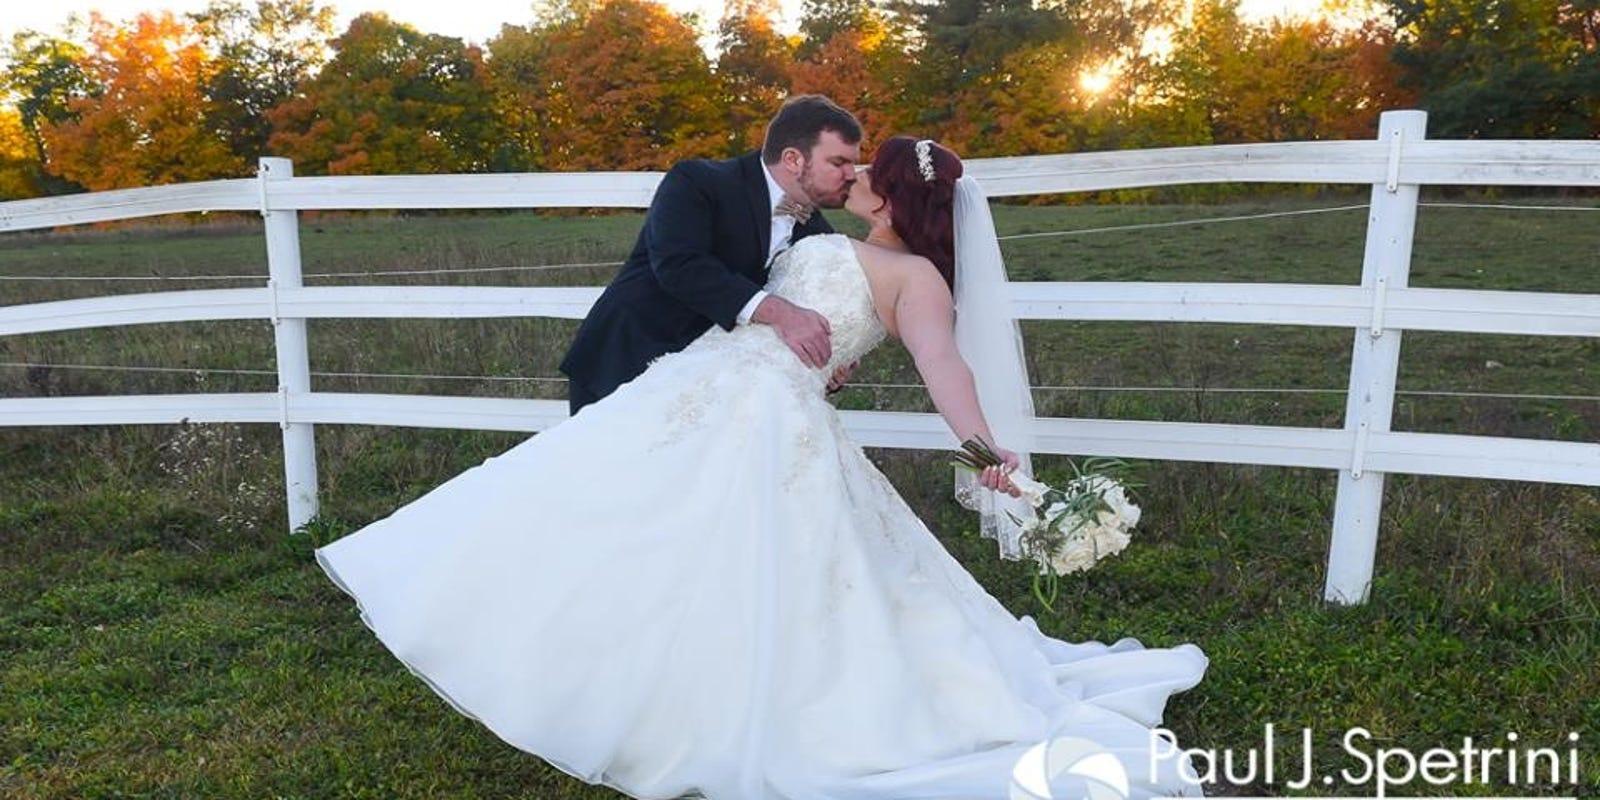 Wedding announcement: Brooke D. Hirsh and James D. Salisbury